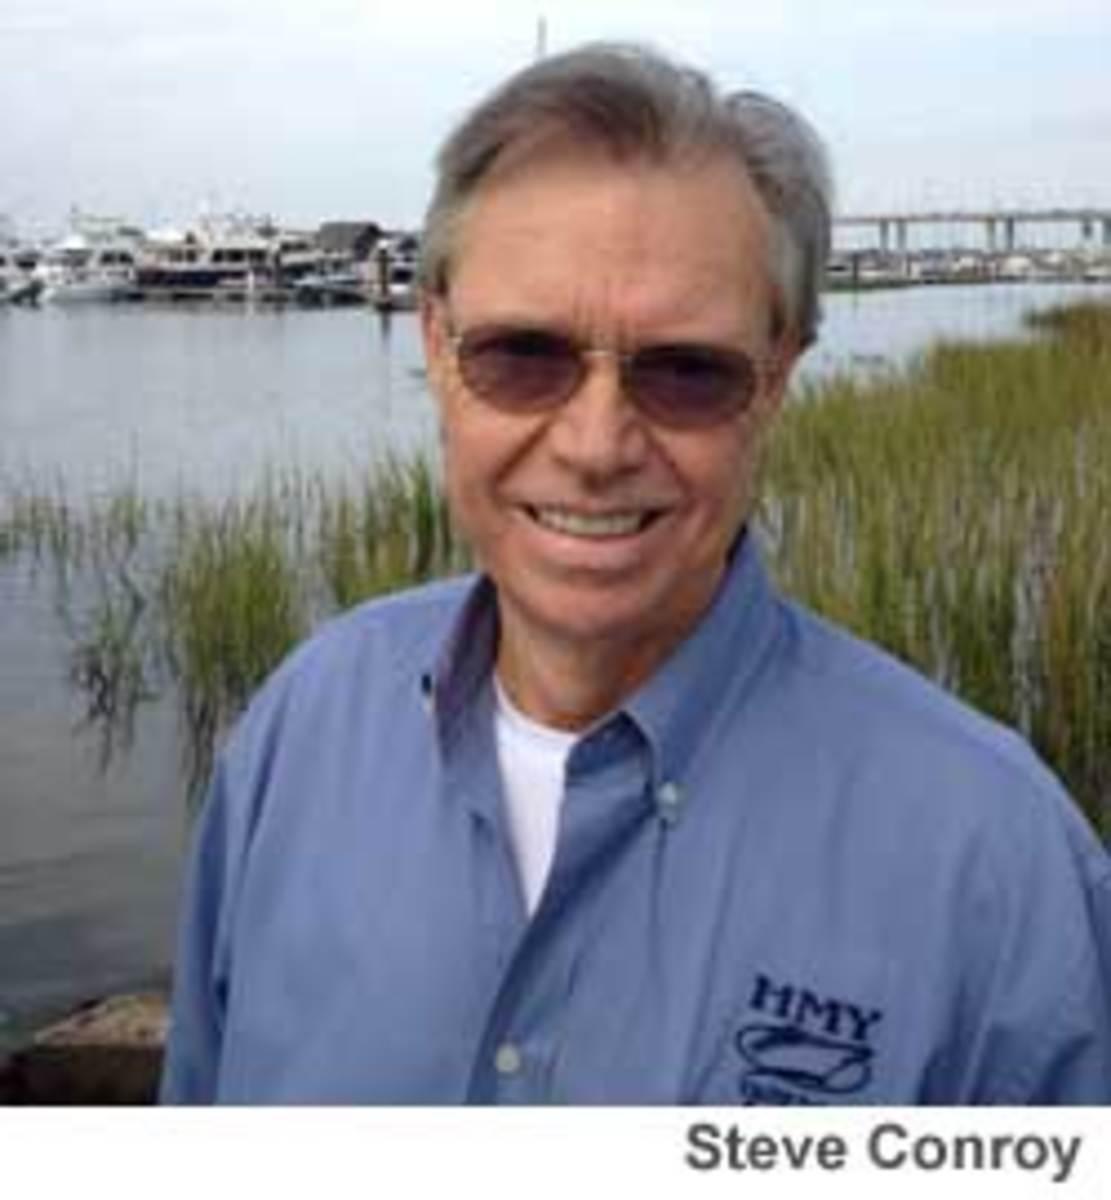 Steve Conroy, HMY Yacht Sales